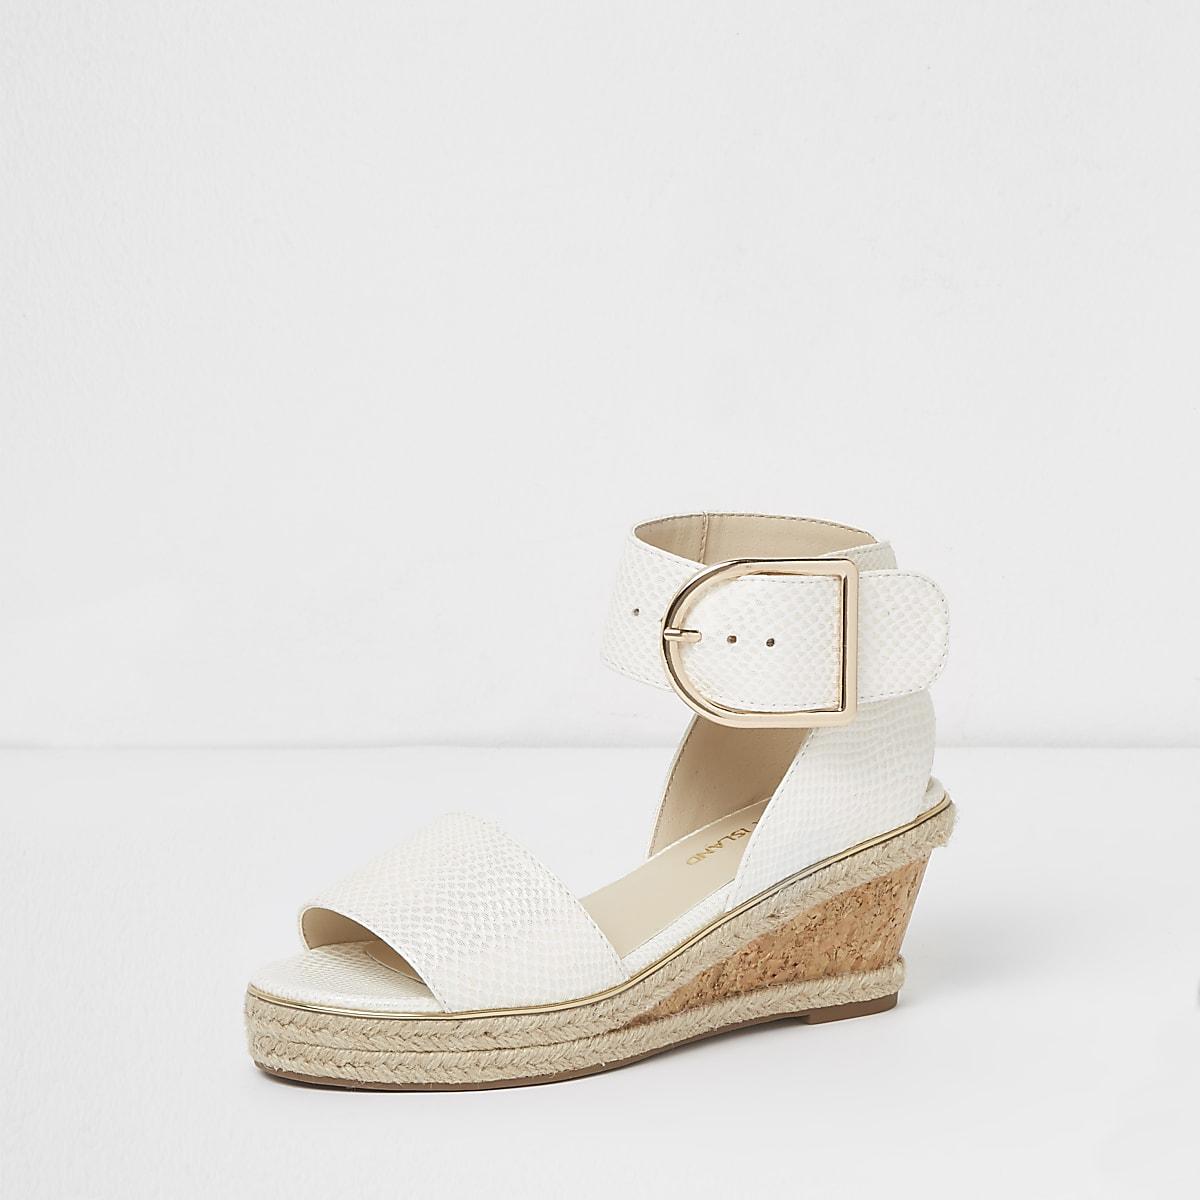 e5339726d0fb Girls white snake embossed espadrille wedges - Sandals - Footwear ...